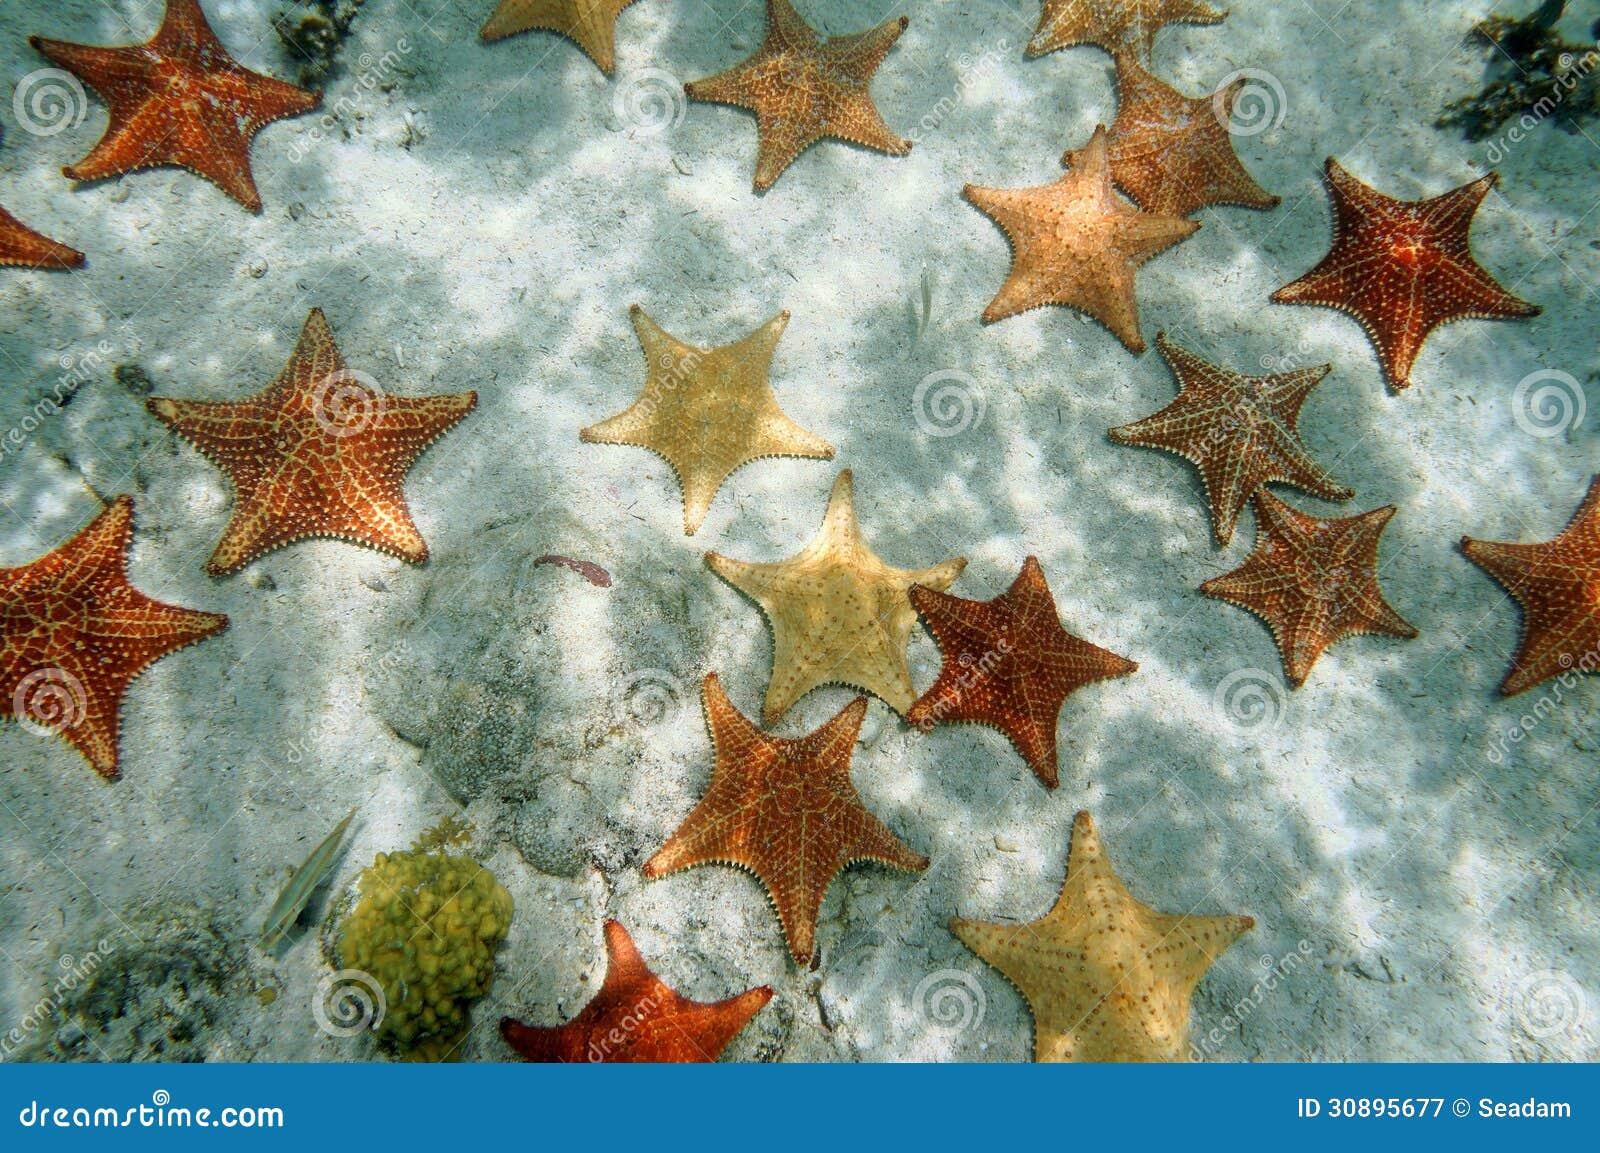 Plenty of starfish on a sandy ocean floor